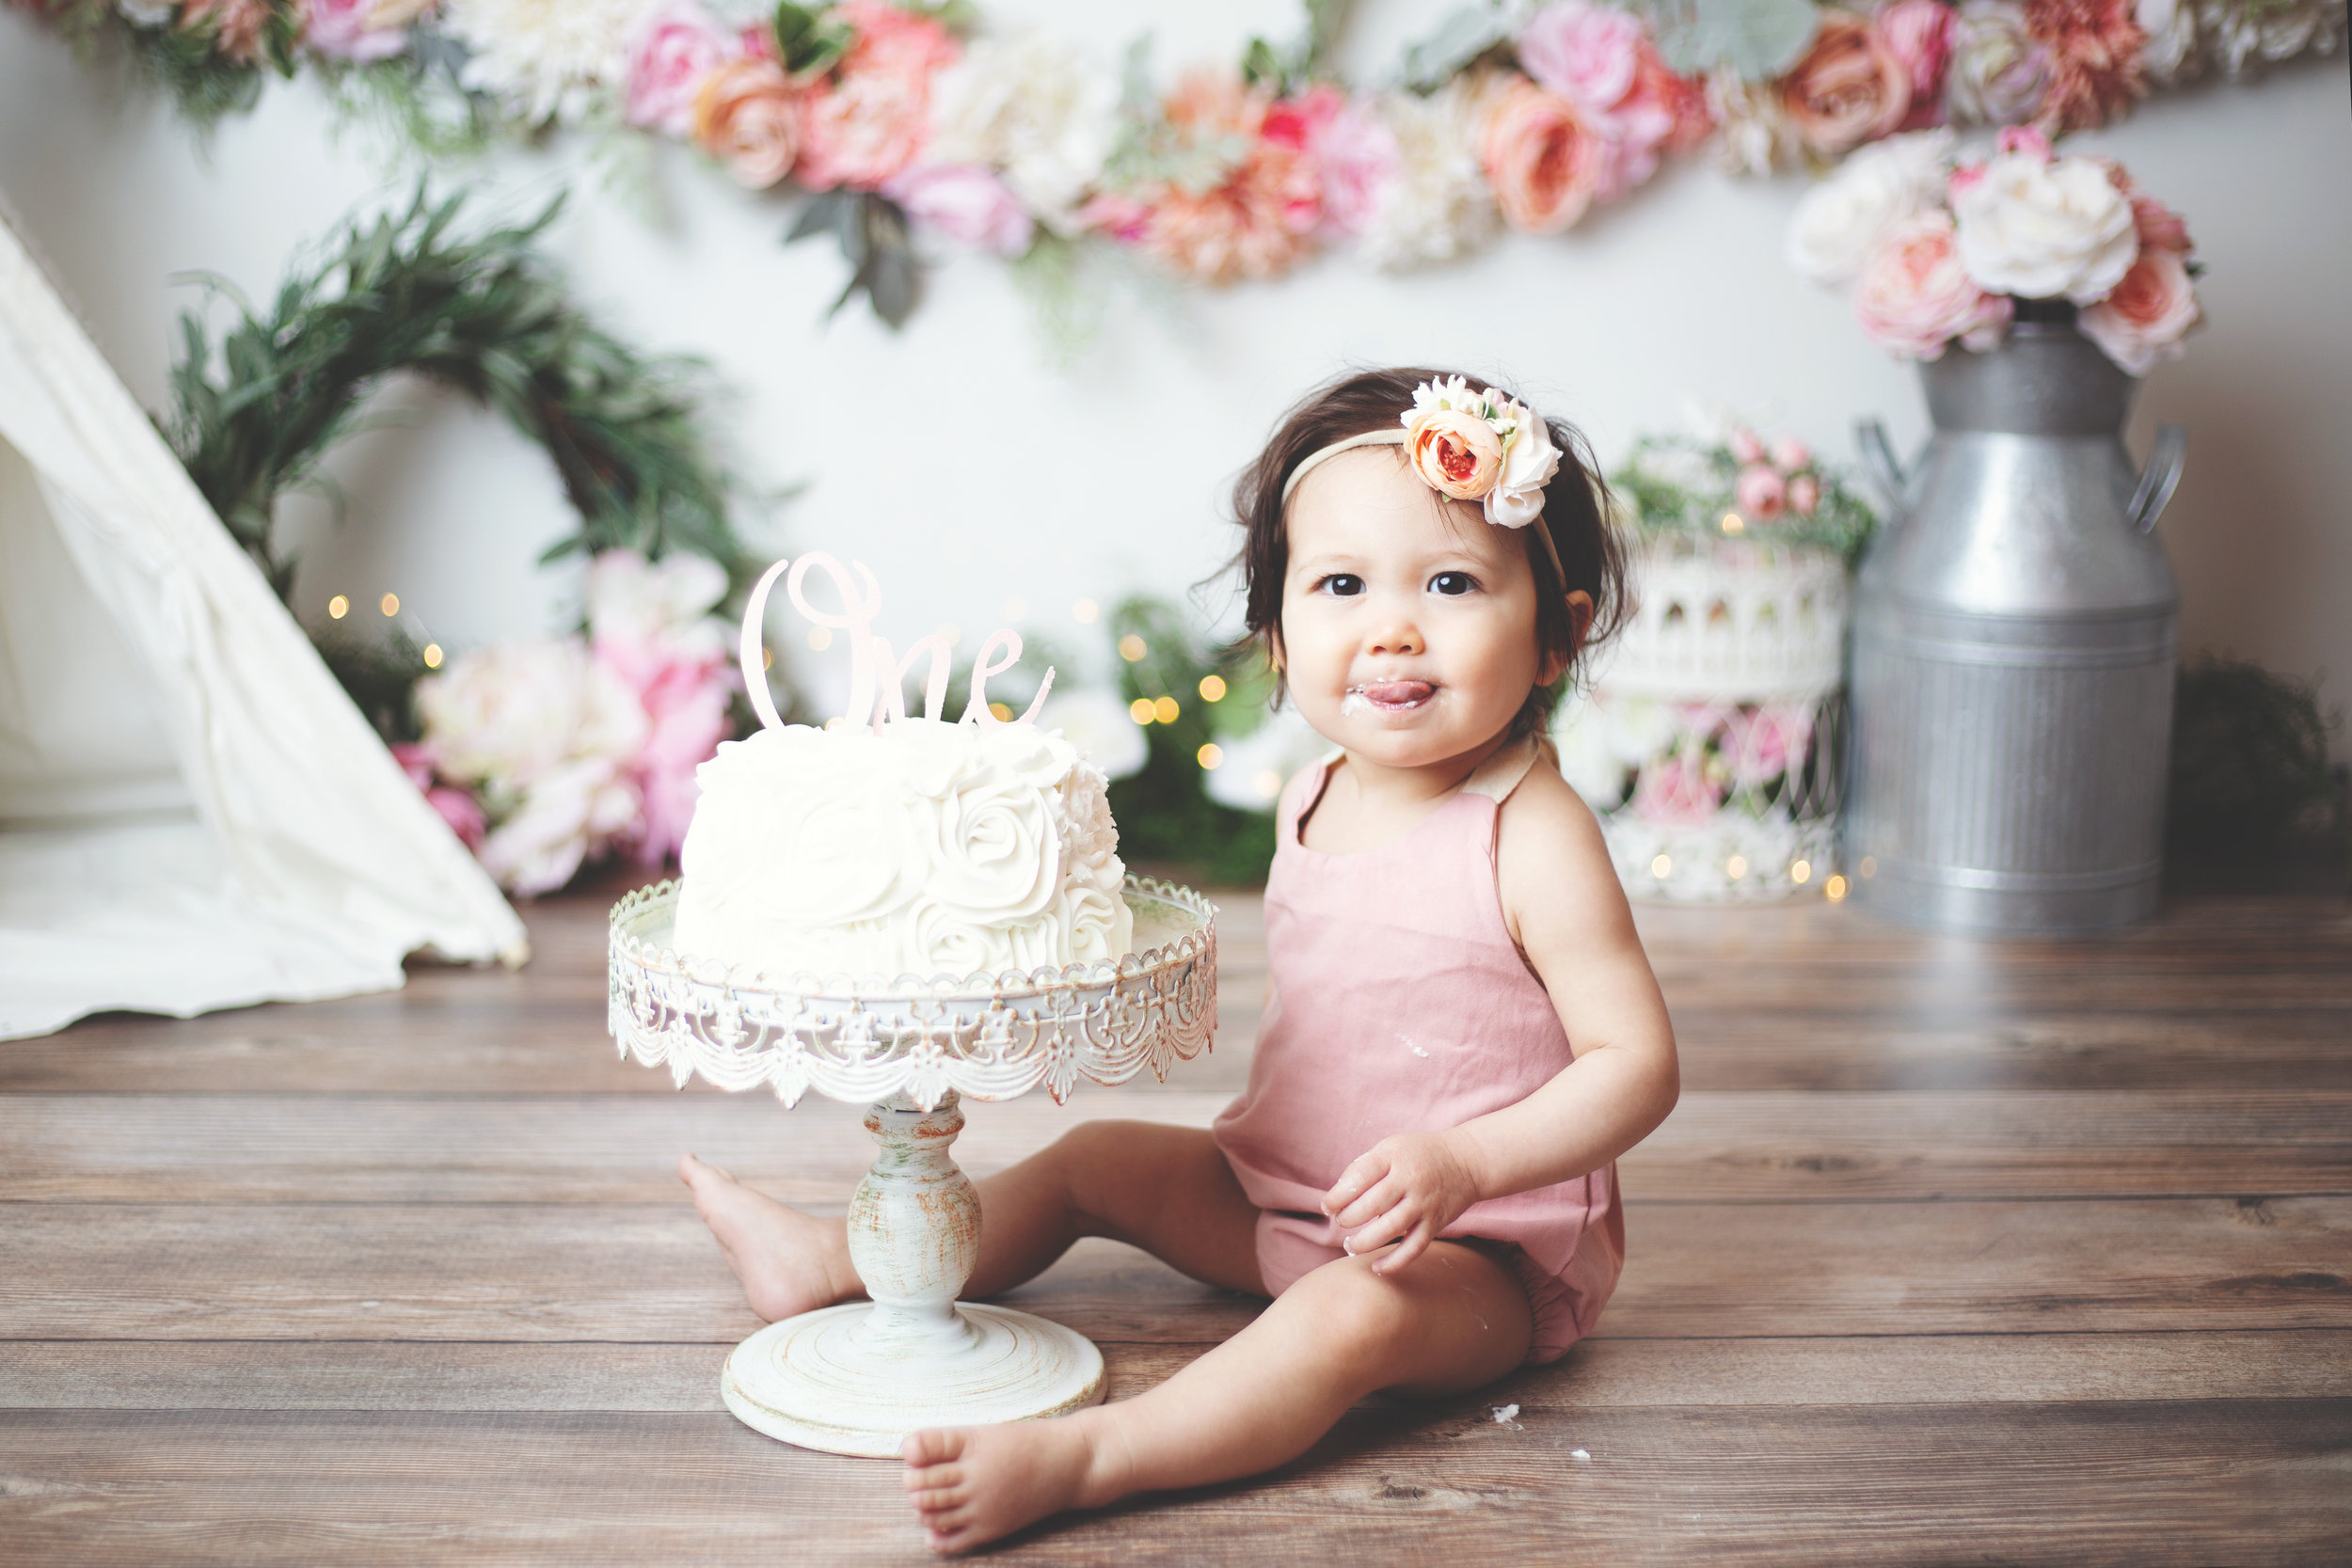 anchorage-cake-smash-photographer-11.jpg